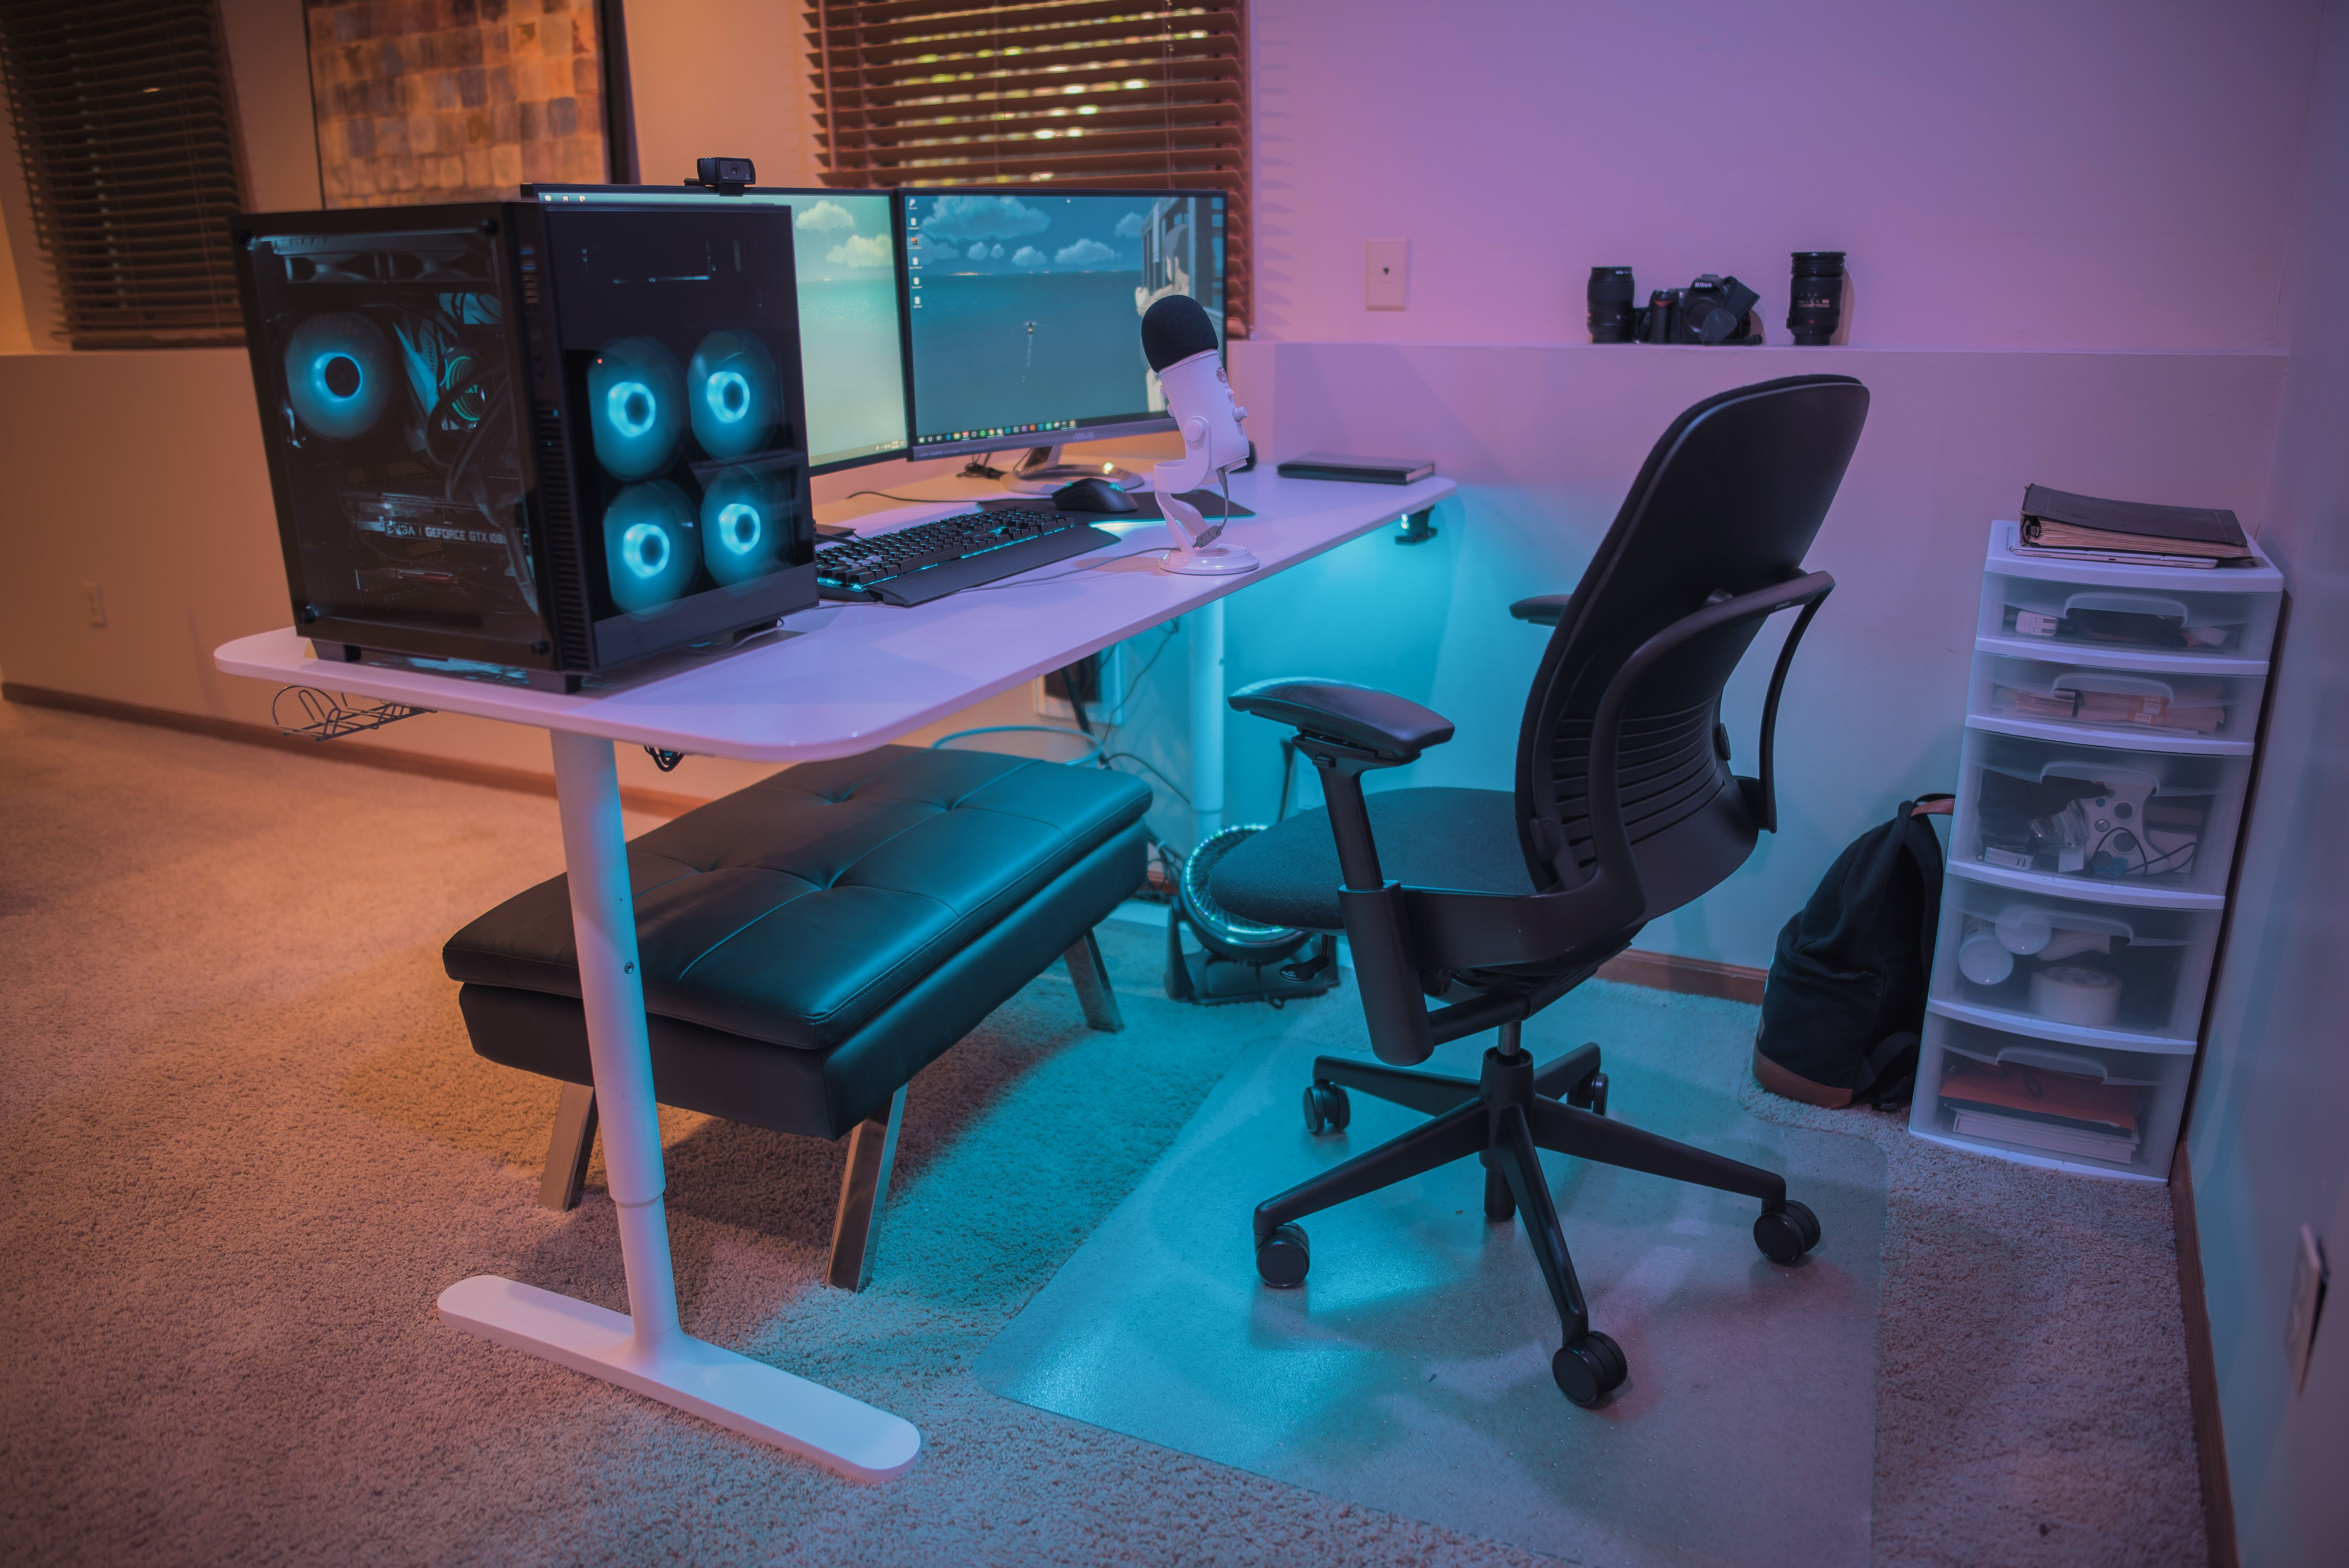 Finally feeling like its complete Desk setup, Desk